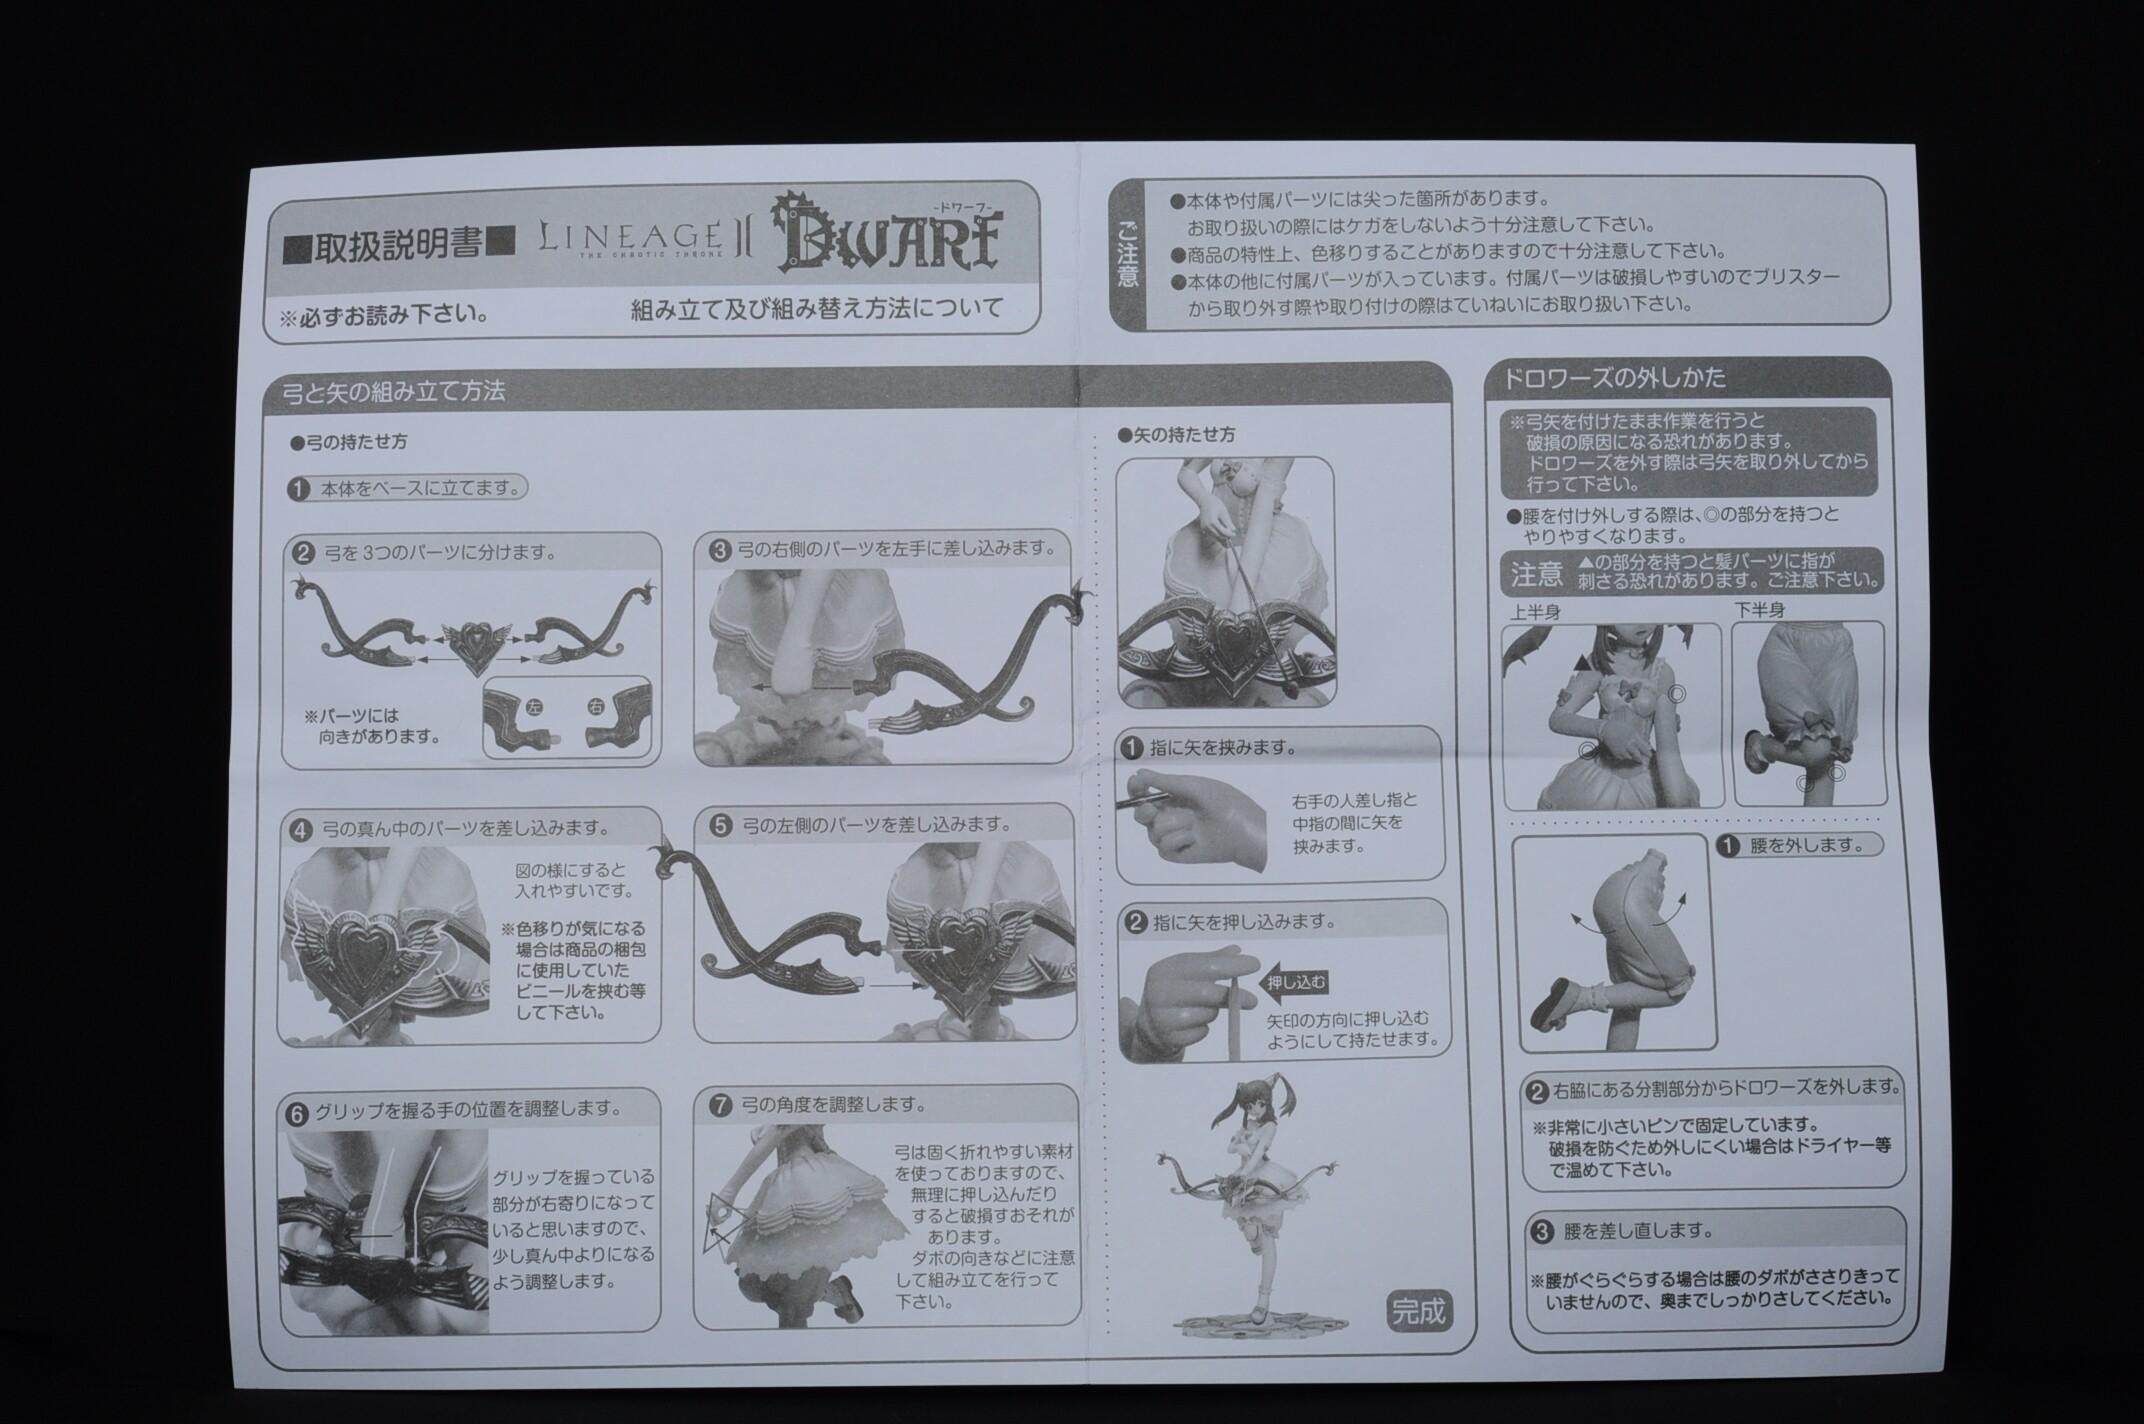 DSC_0008_20110116194211.jpg